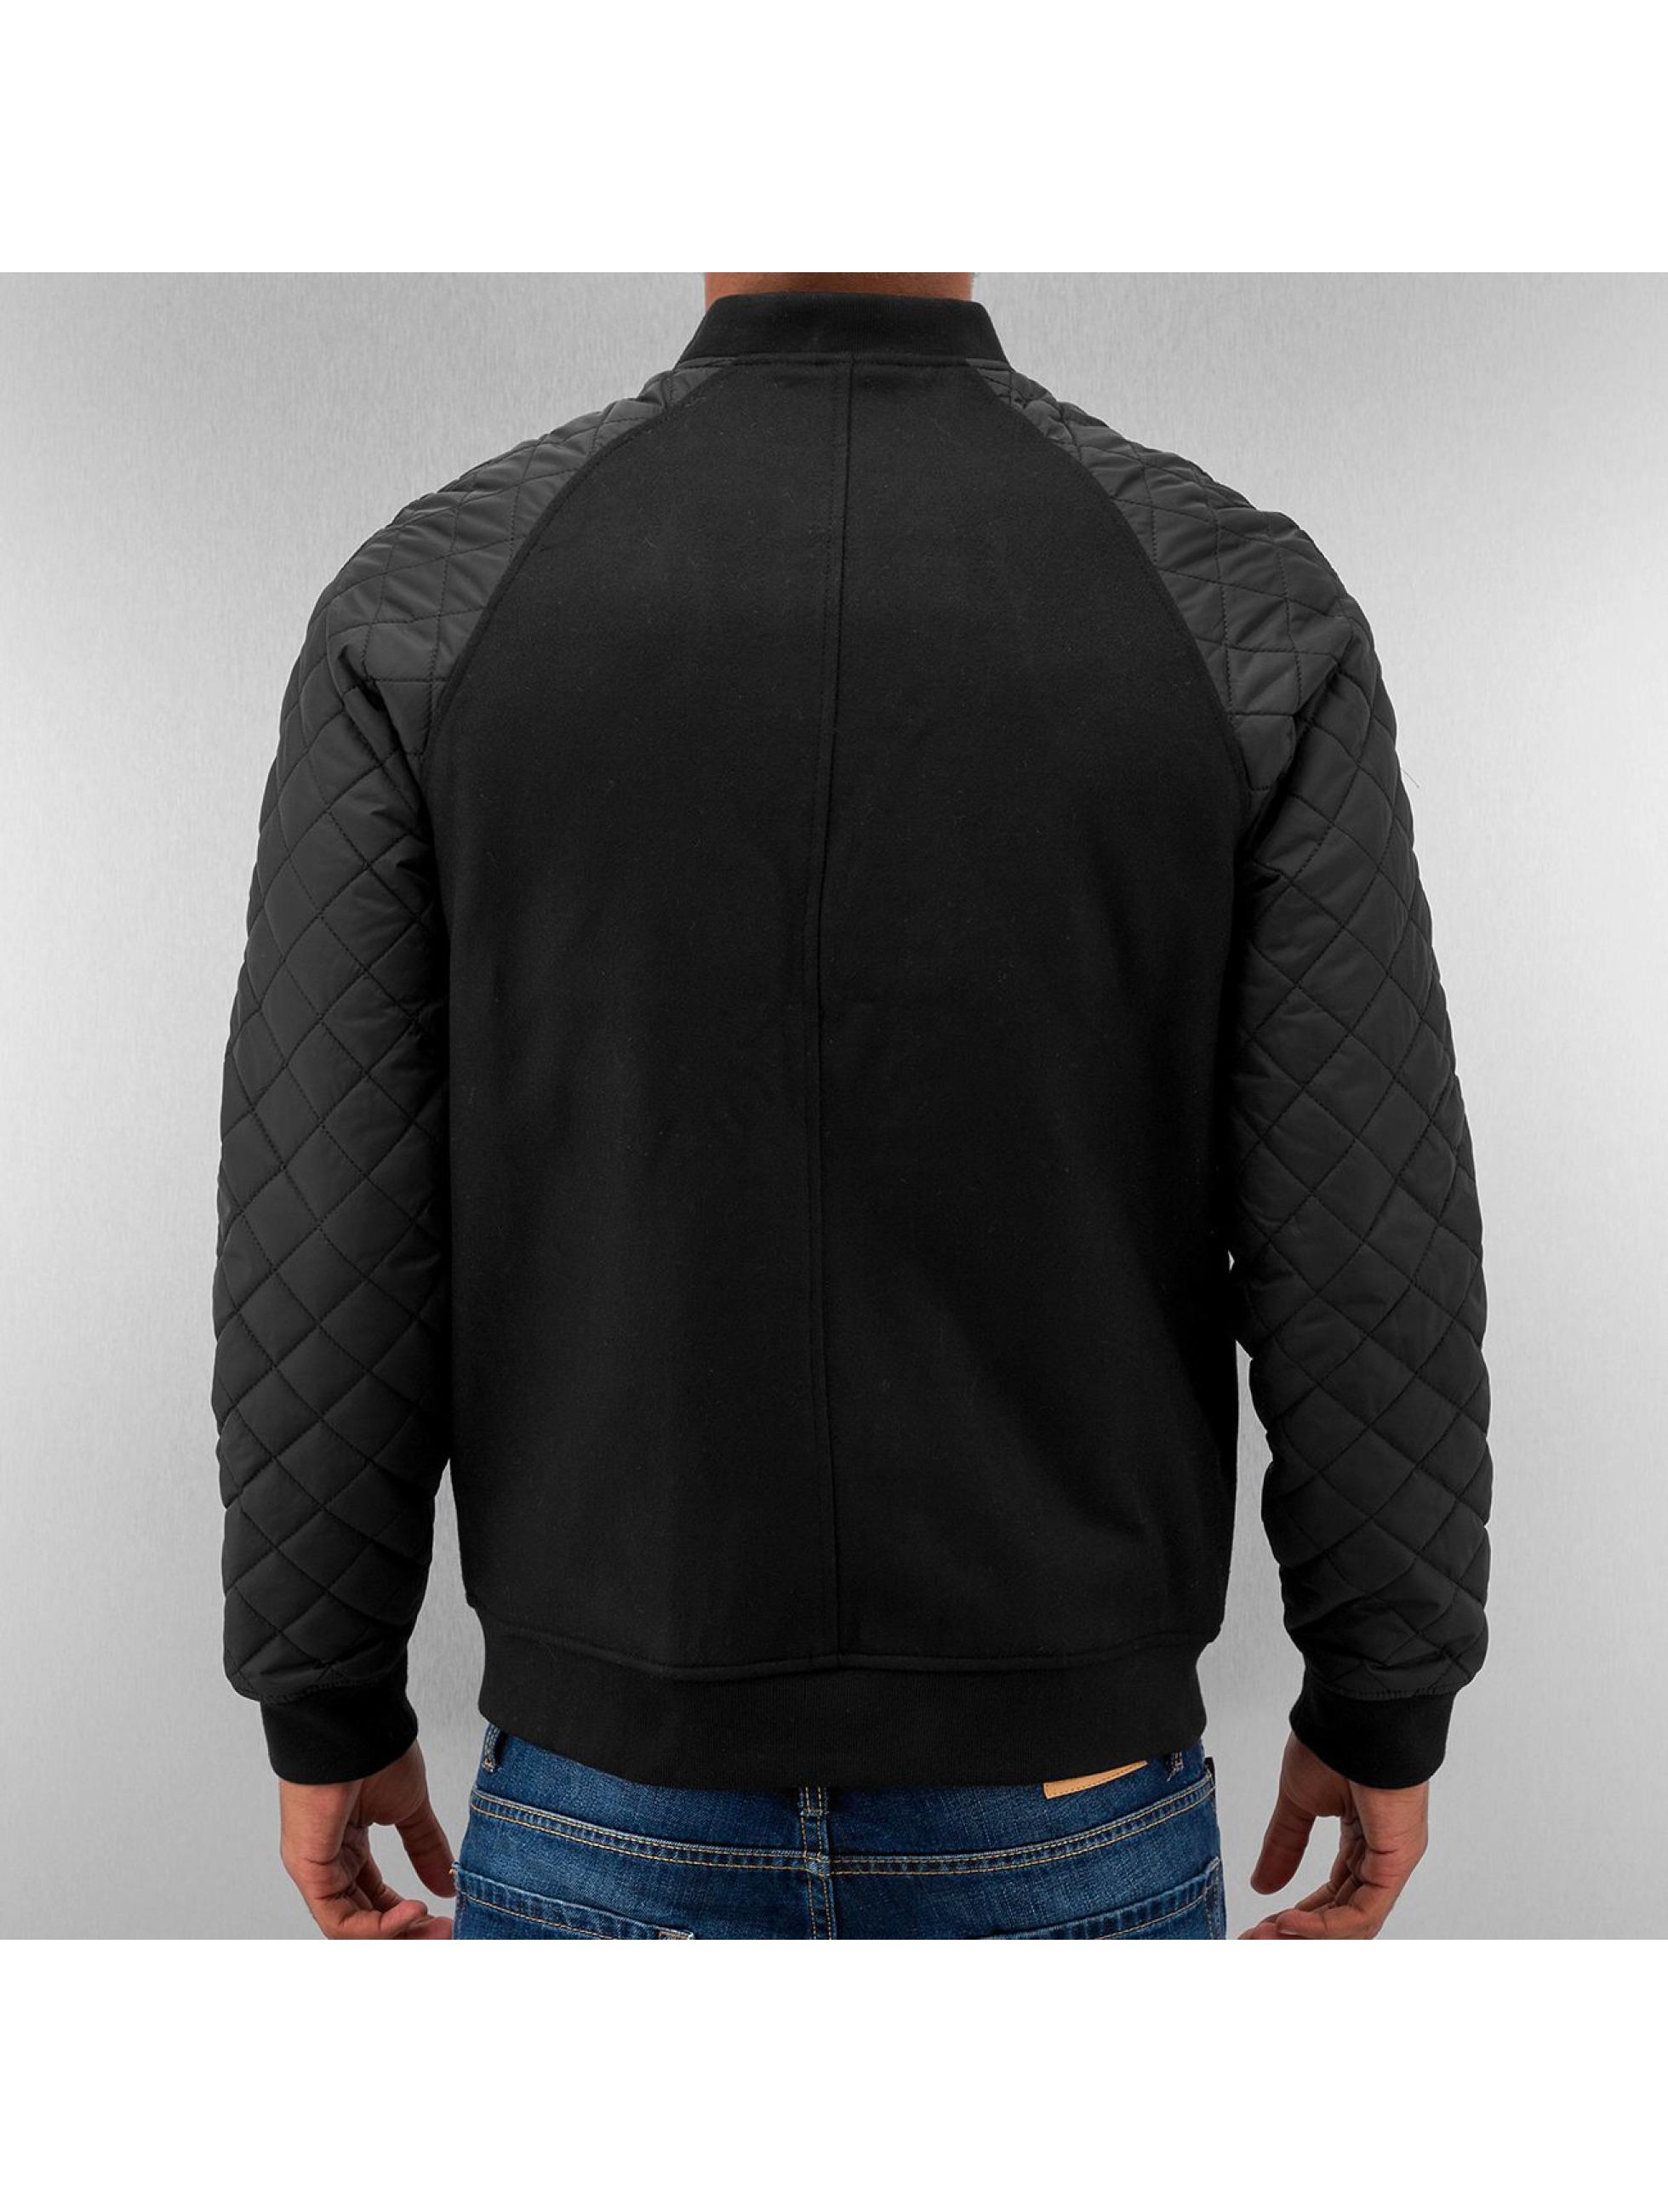 Urban Classics Bomberjacke Diamond Nylon Wool schwarz